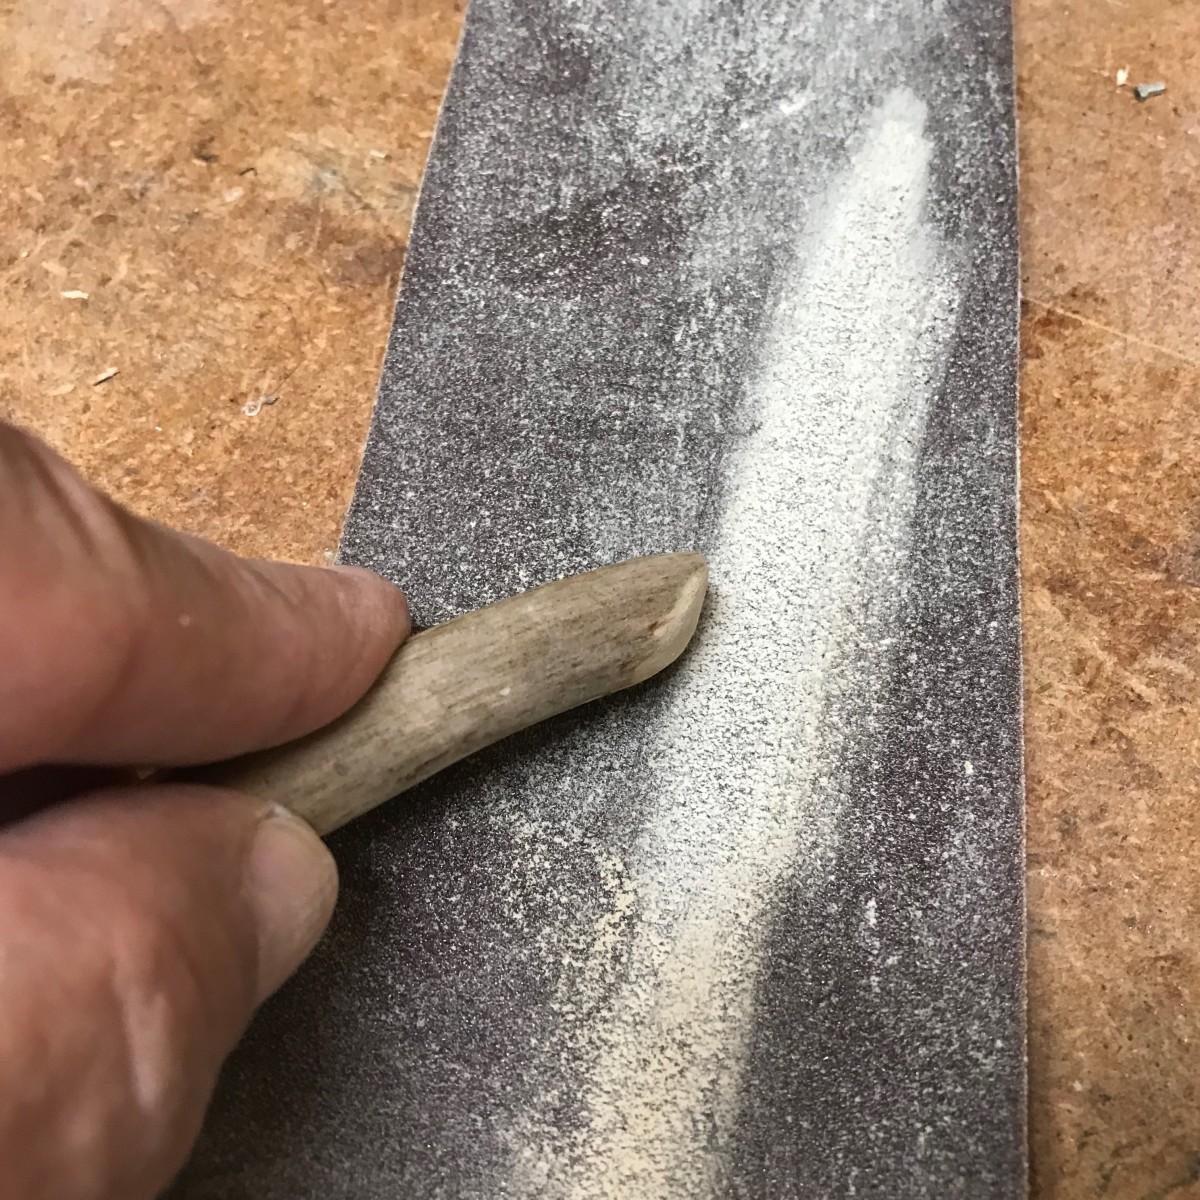 Fine sanding